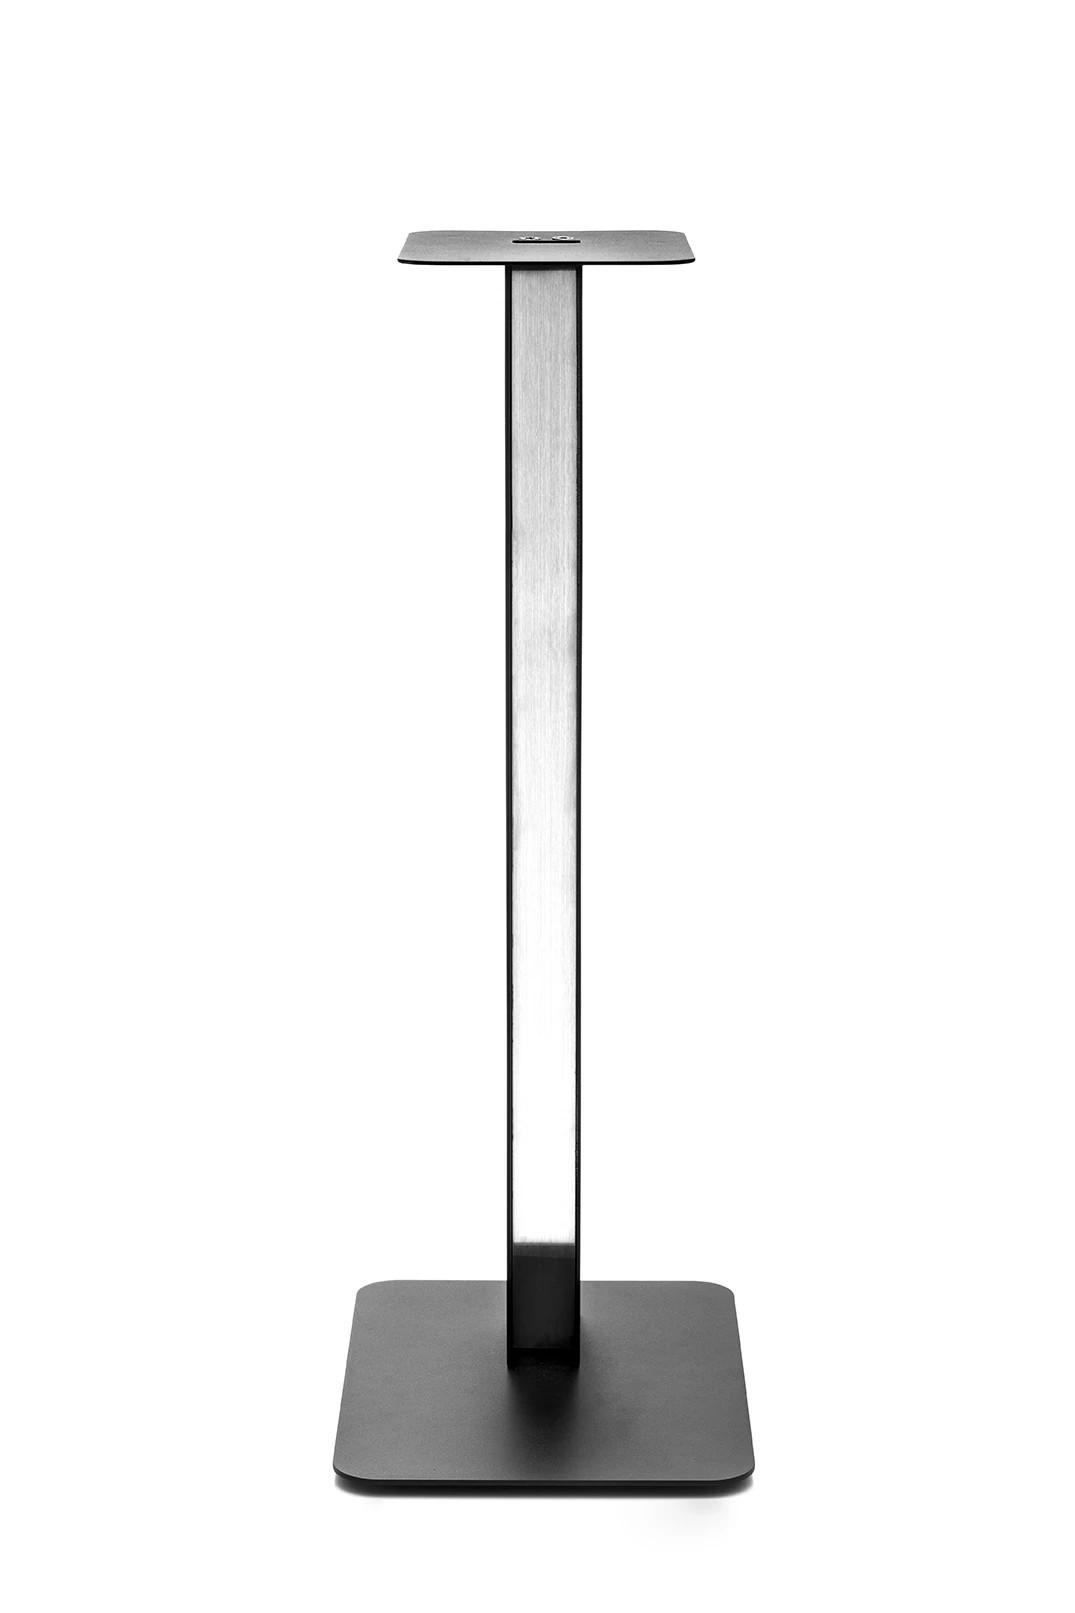 Argon Audio Stative 62 Speaker Stand Pair